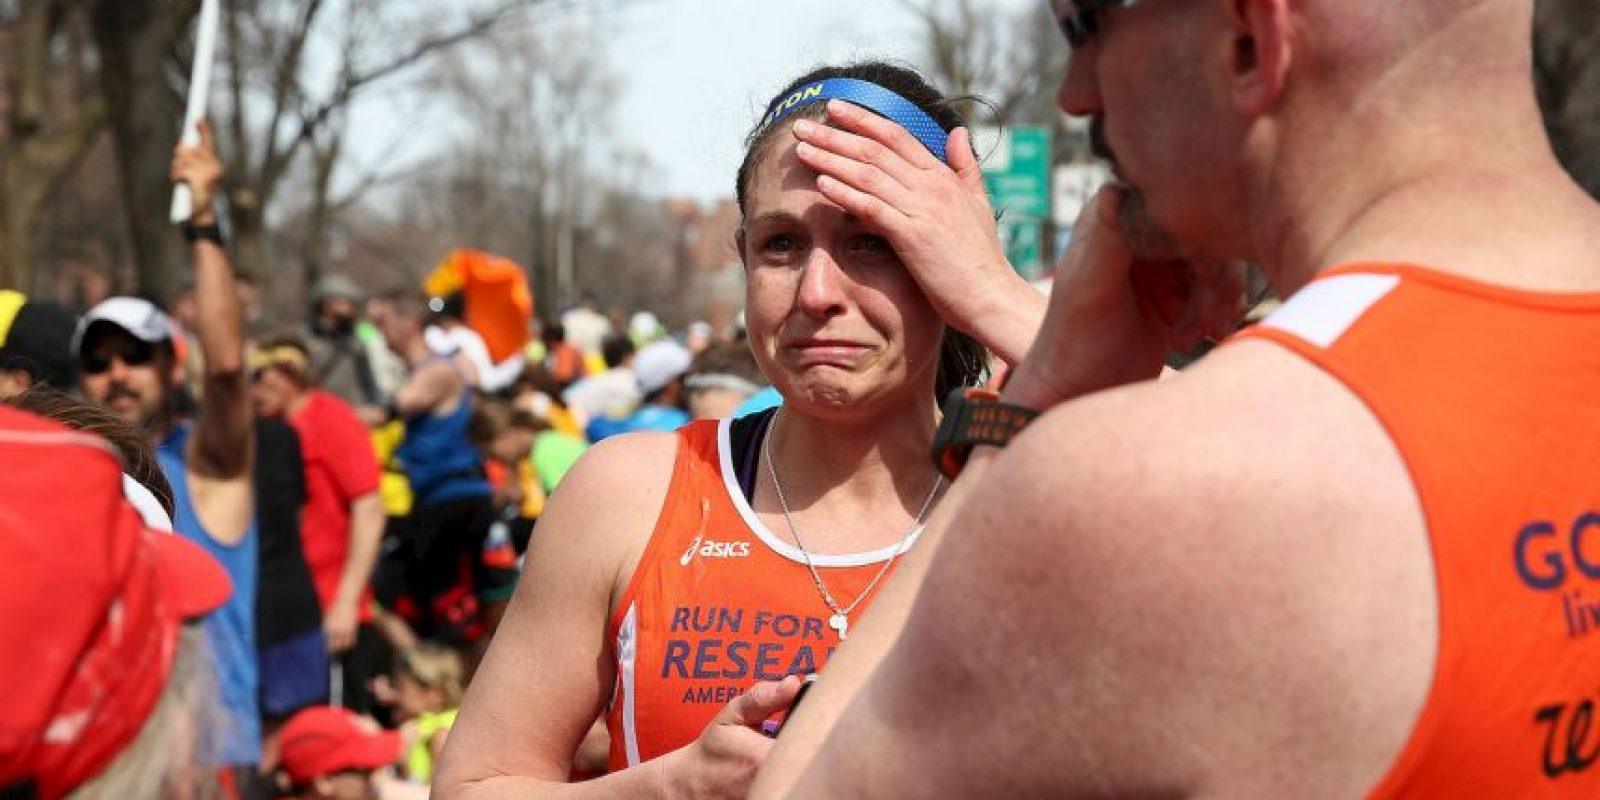 Atentado contra maratón de Boston